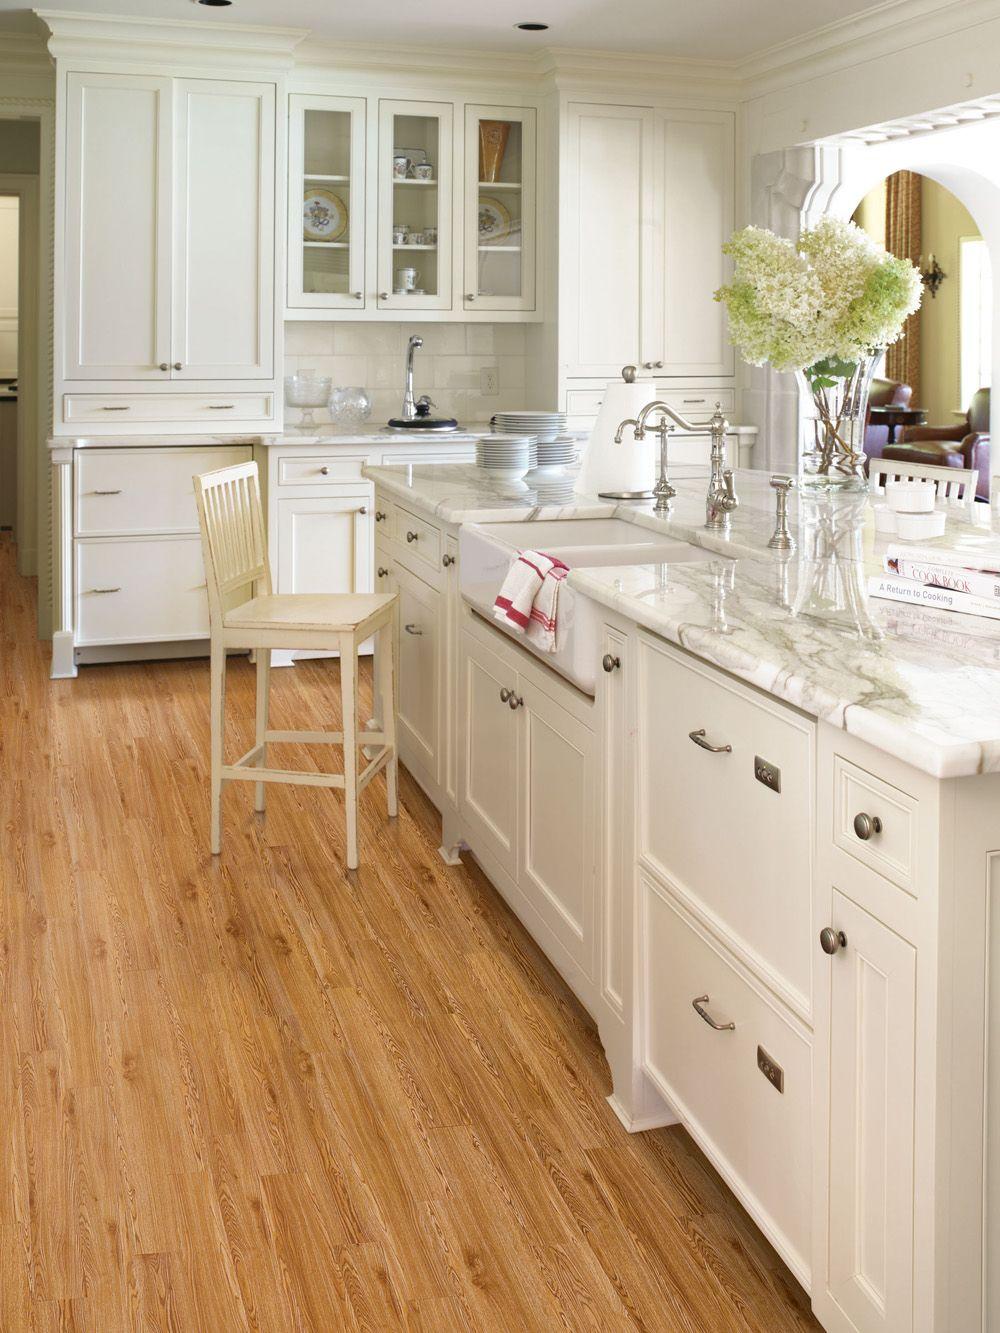 Modern White Kitchens With Wood Floors   DECORKEUN